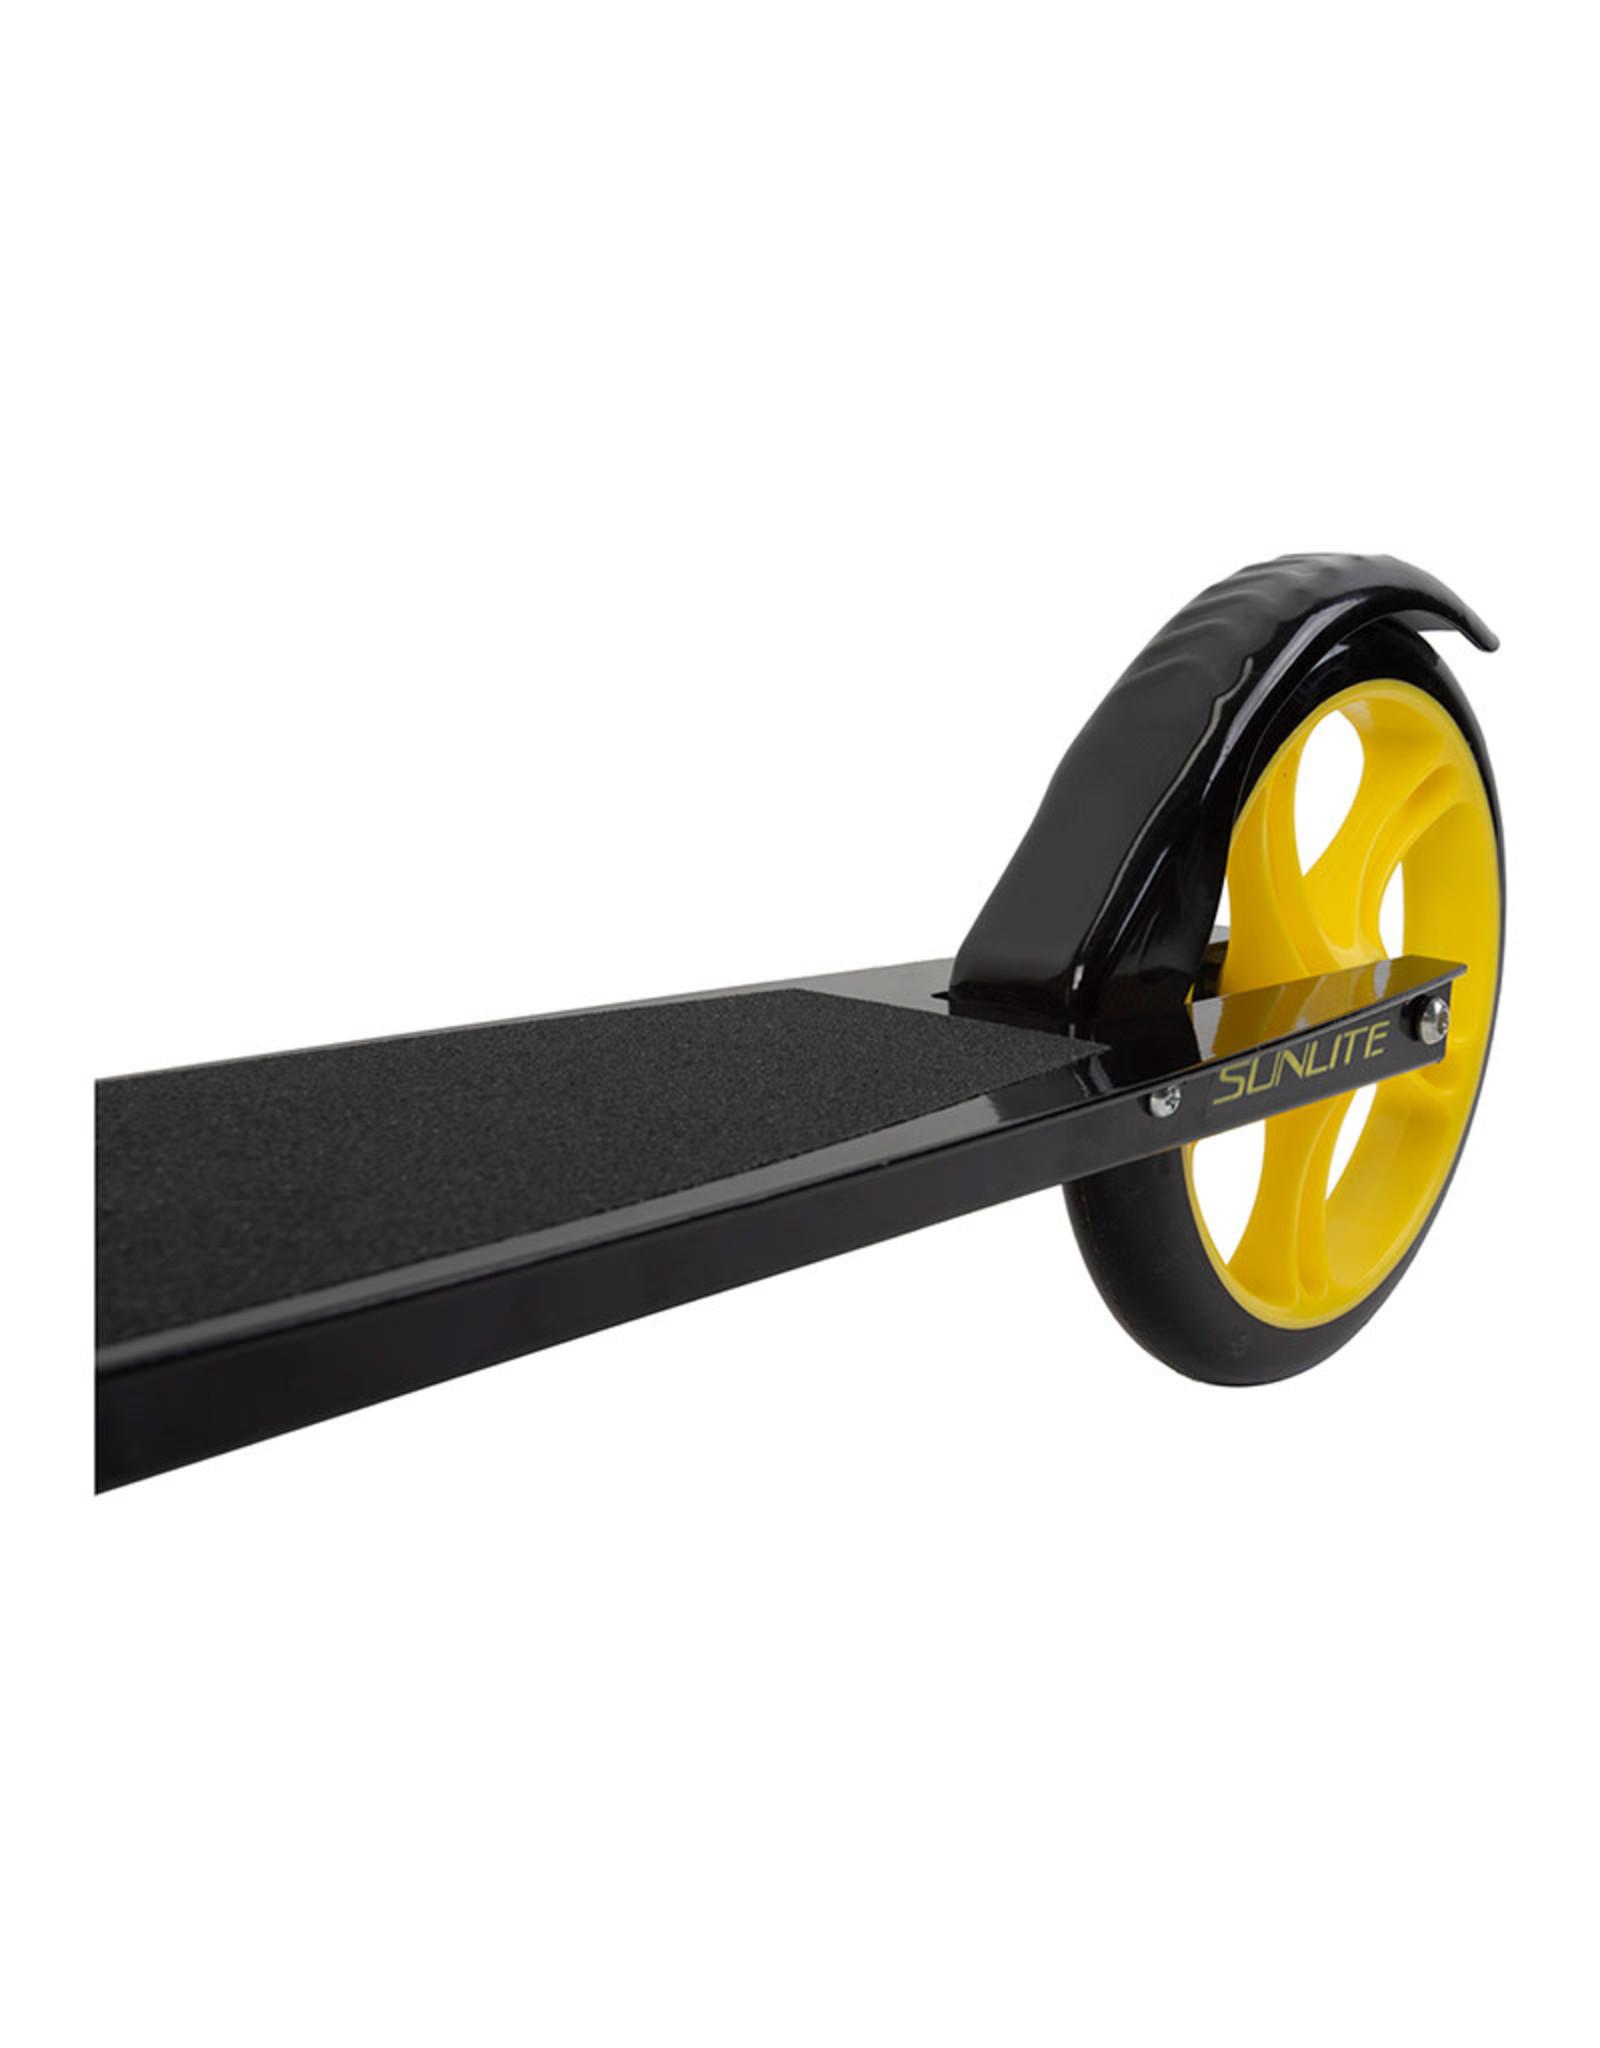 SUNLITE Sunlite Scooter SC1; Black